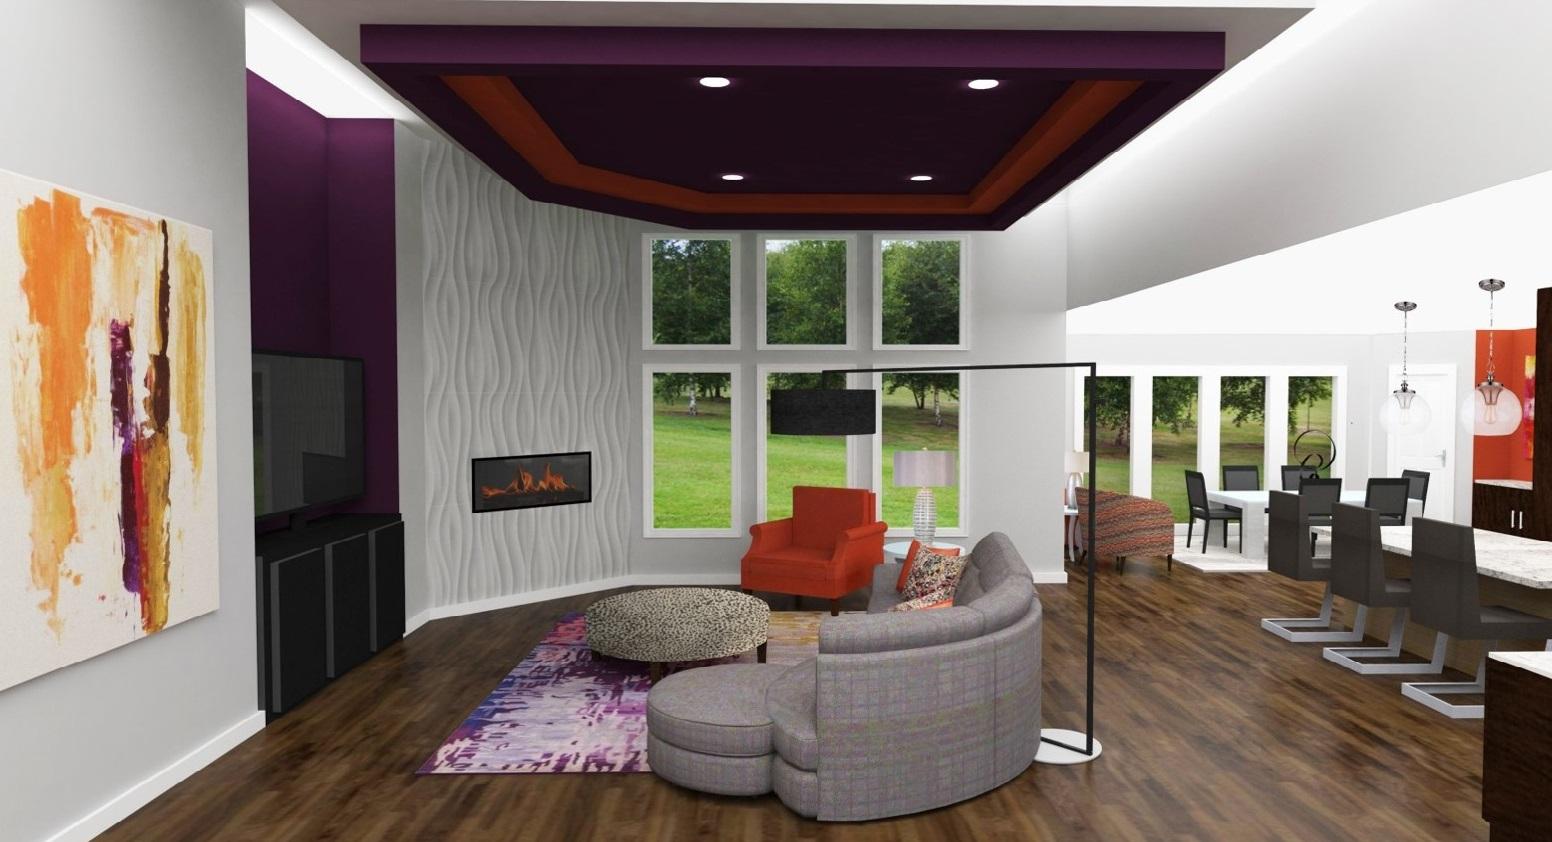 Interior Design Experience Program Id Cincinnati Designs For You